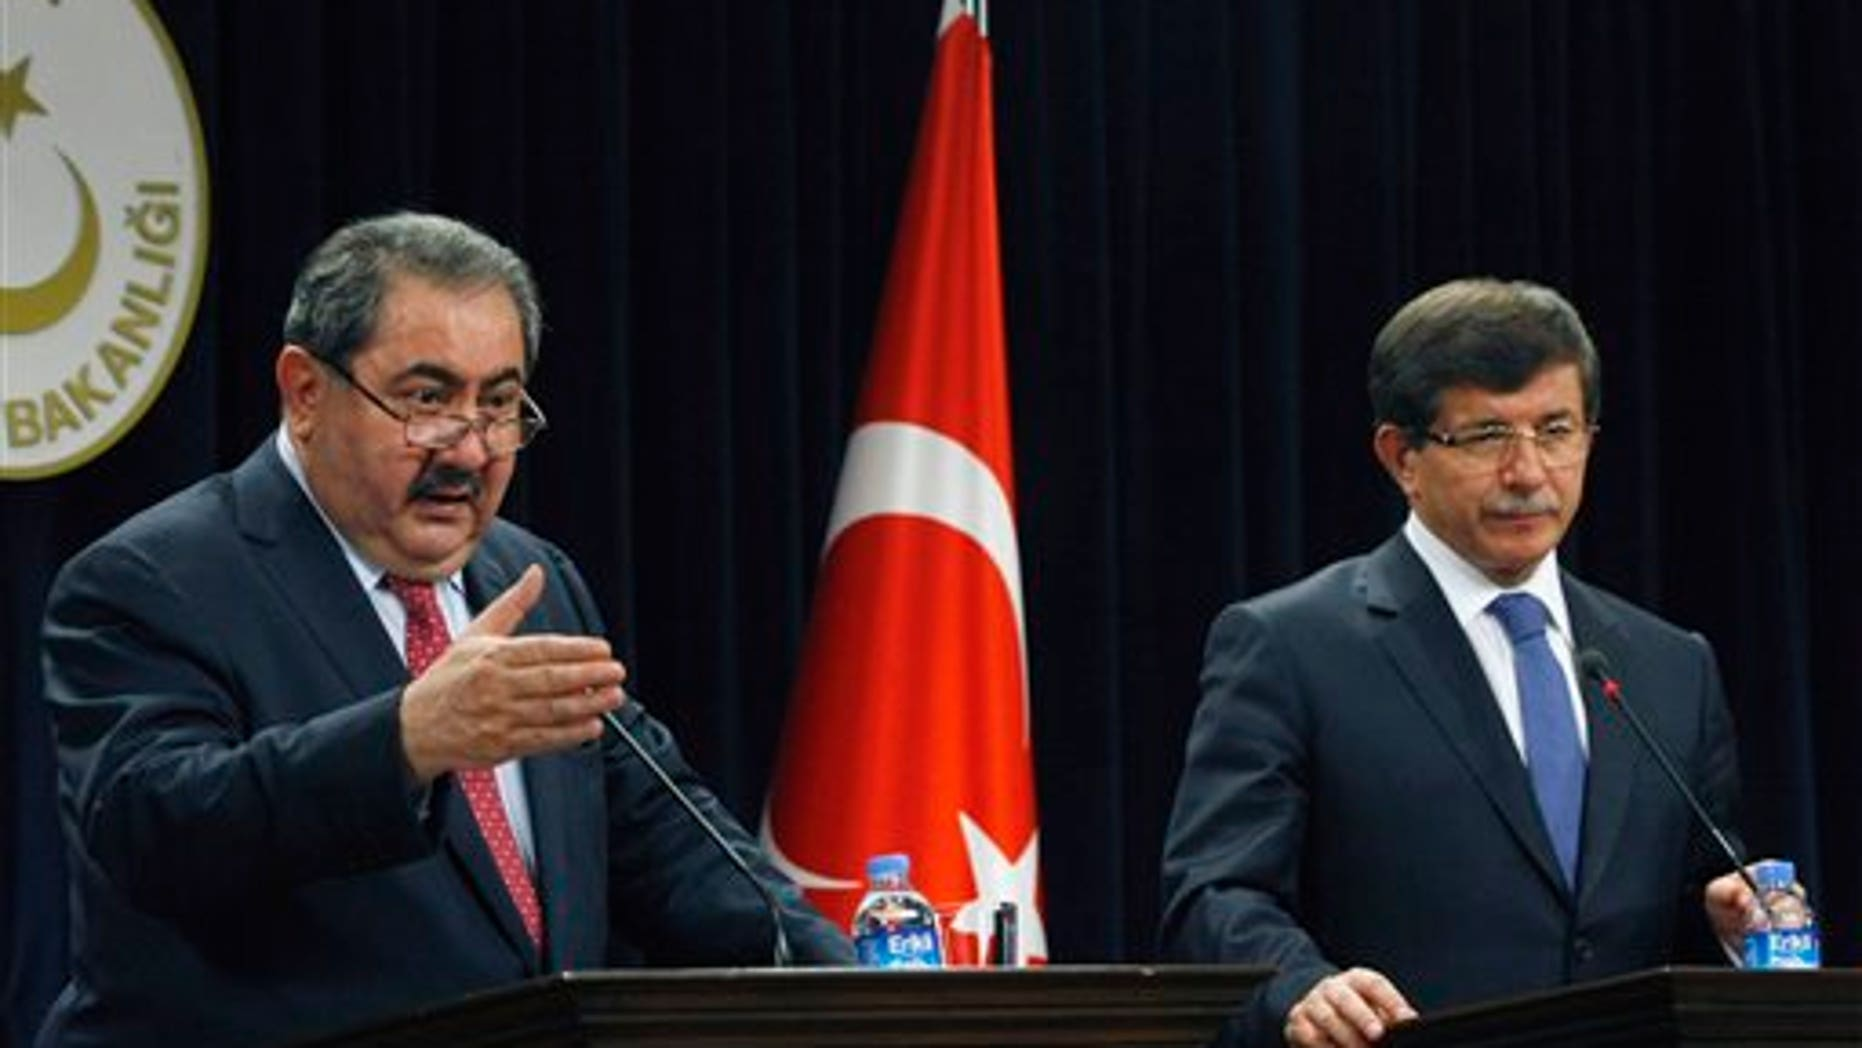 October 13: Iraqi Foreign Minister Hoshyar Zebari, left, and his Turkish counterpart Ahmet Davutoglu speak to the media after their talks in Ankara, Turkey.